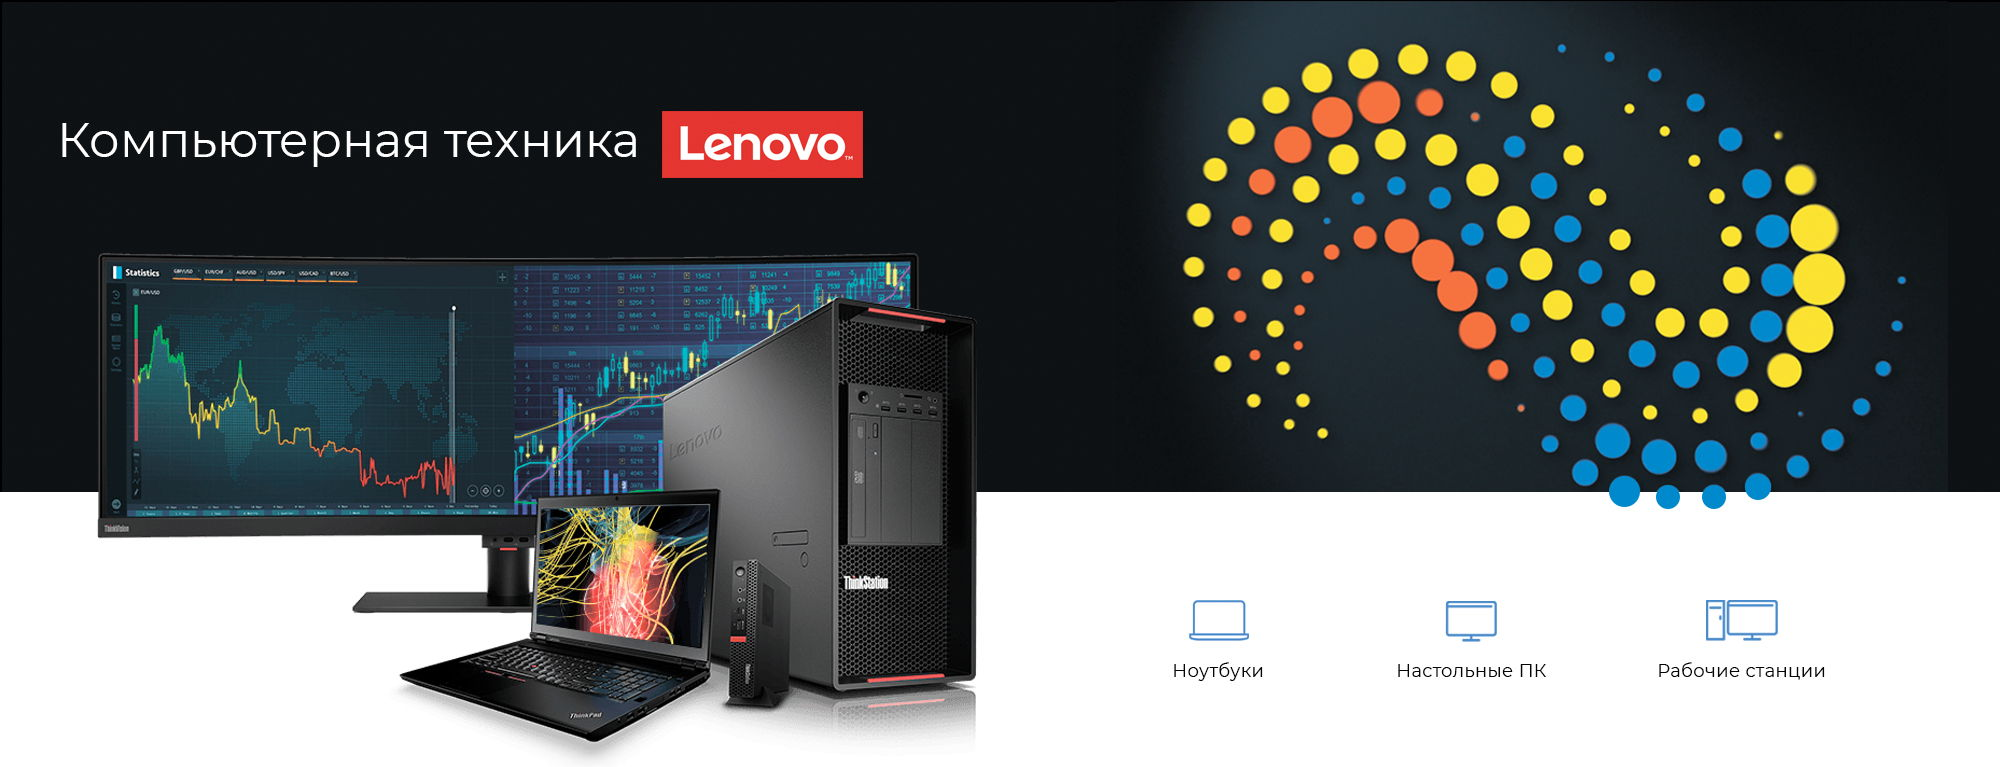 Компьютерная-техника-от-Lenovo